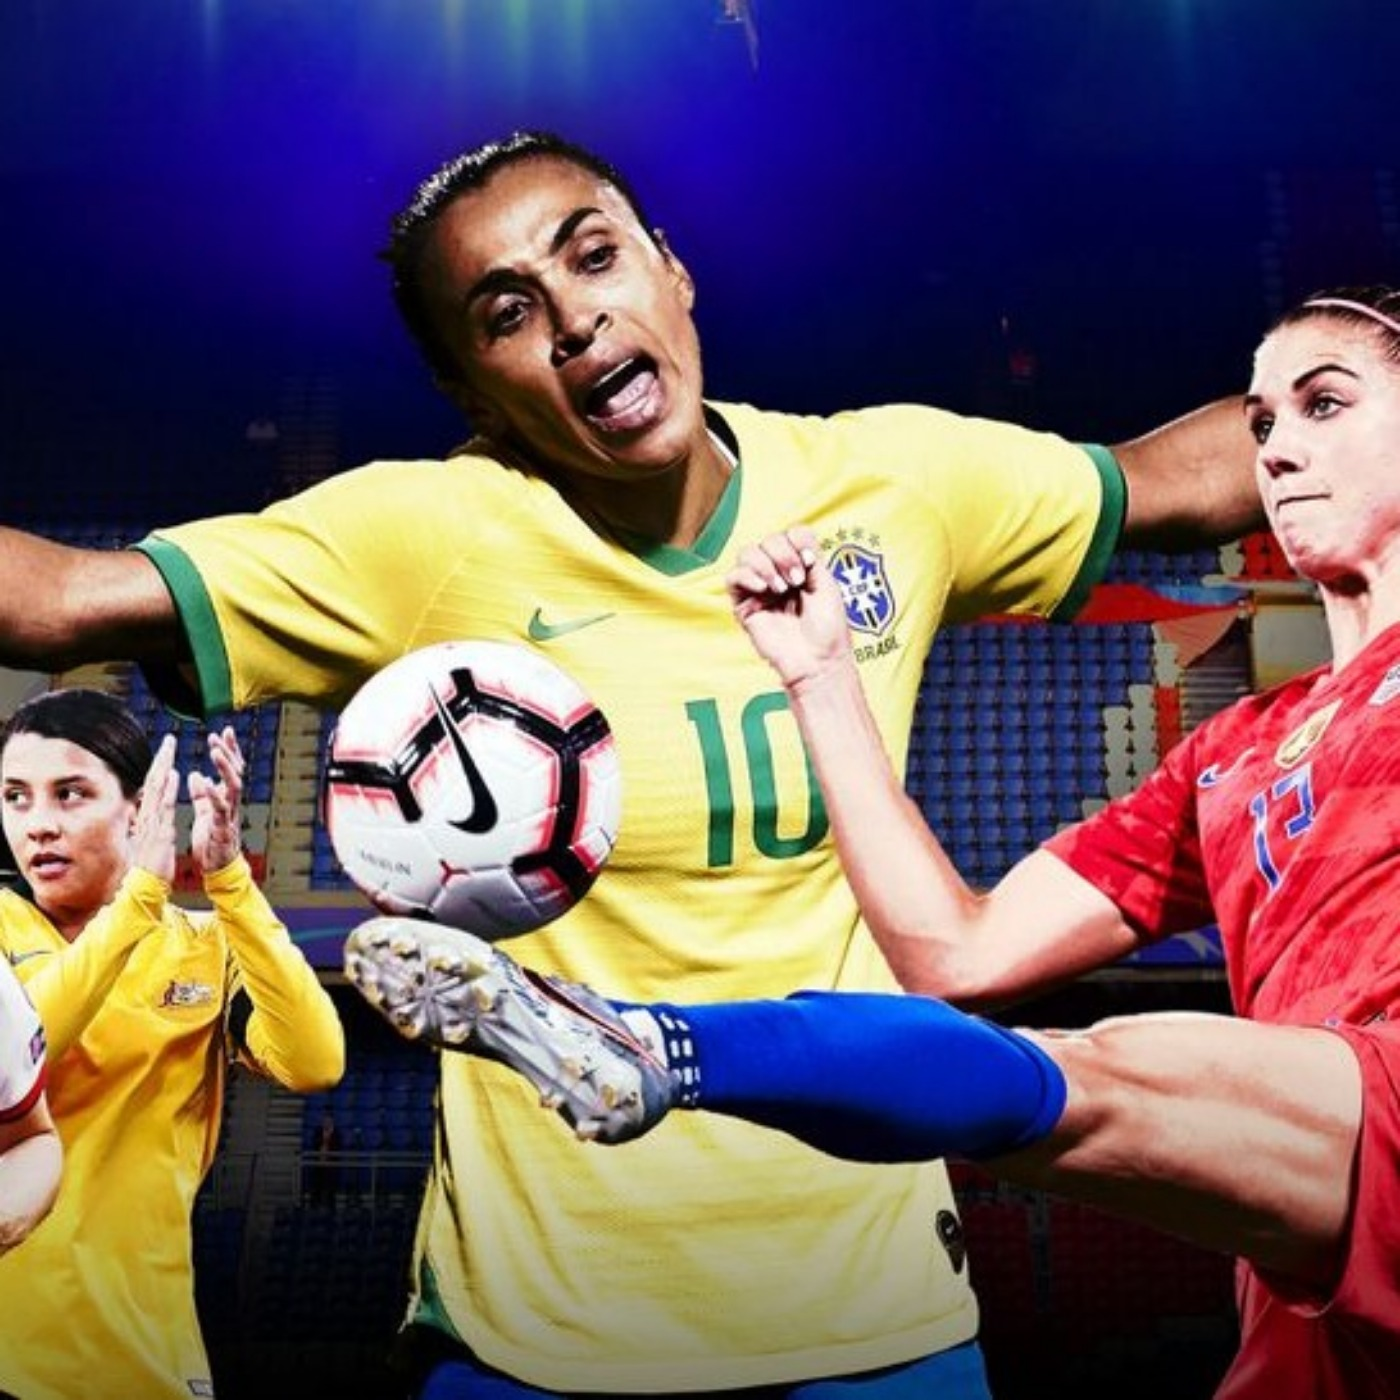 357 - Com a licença... As mulheres. Women's World Cup!